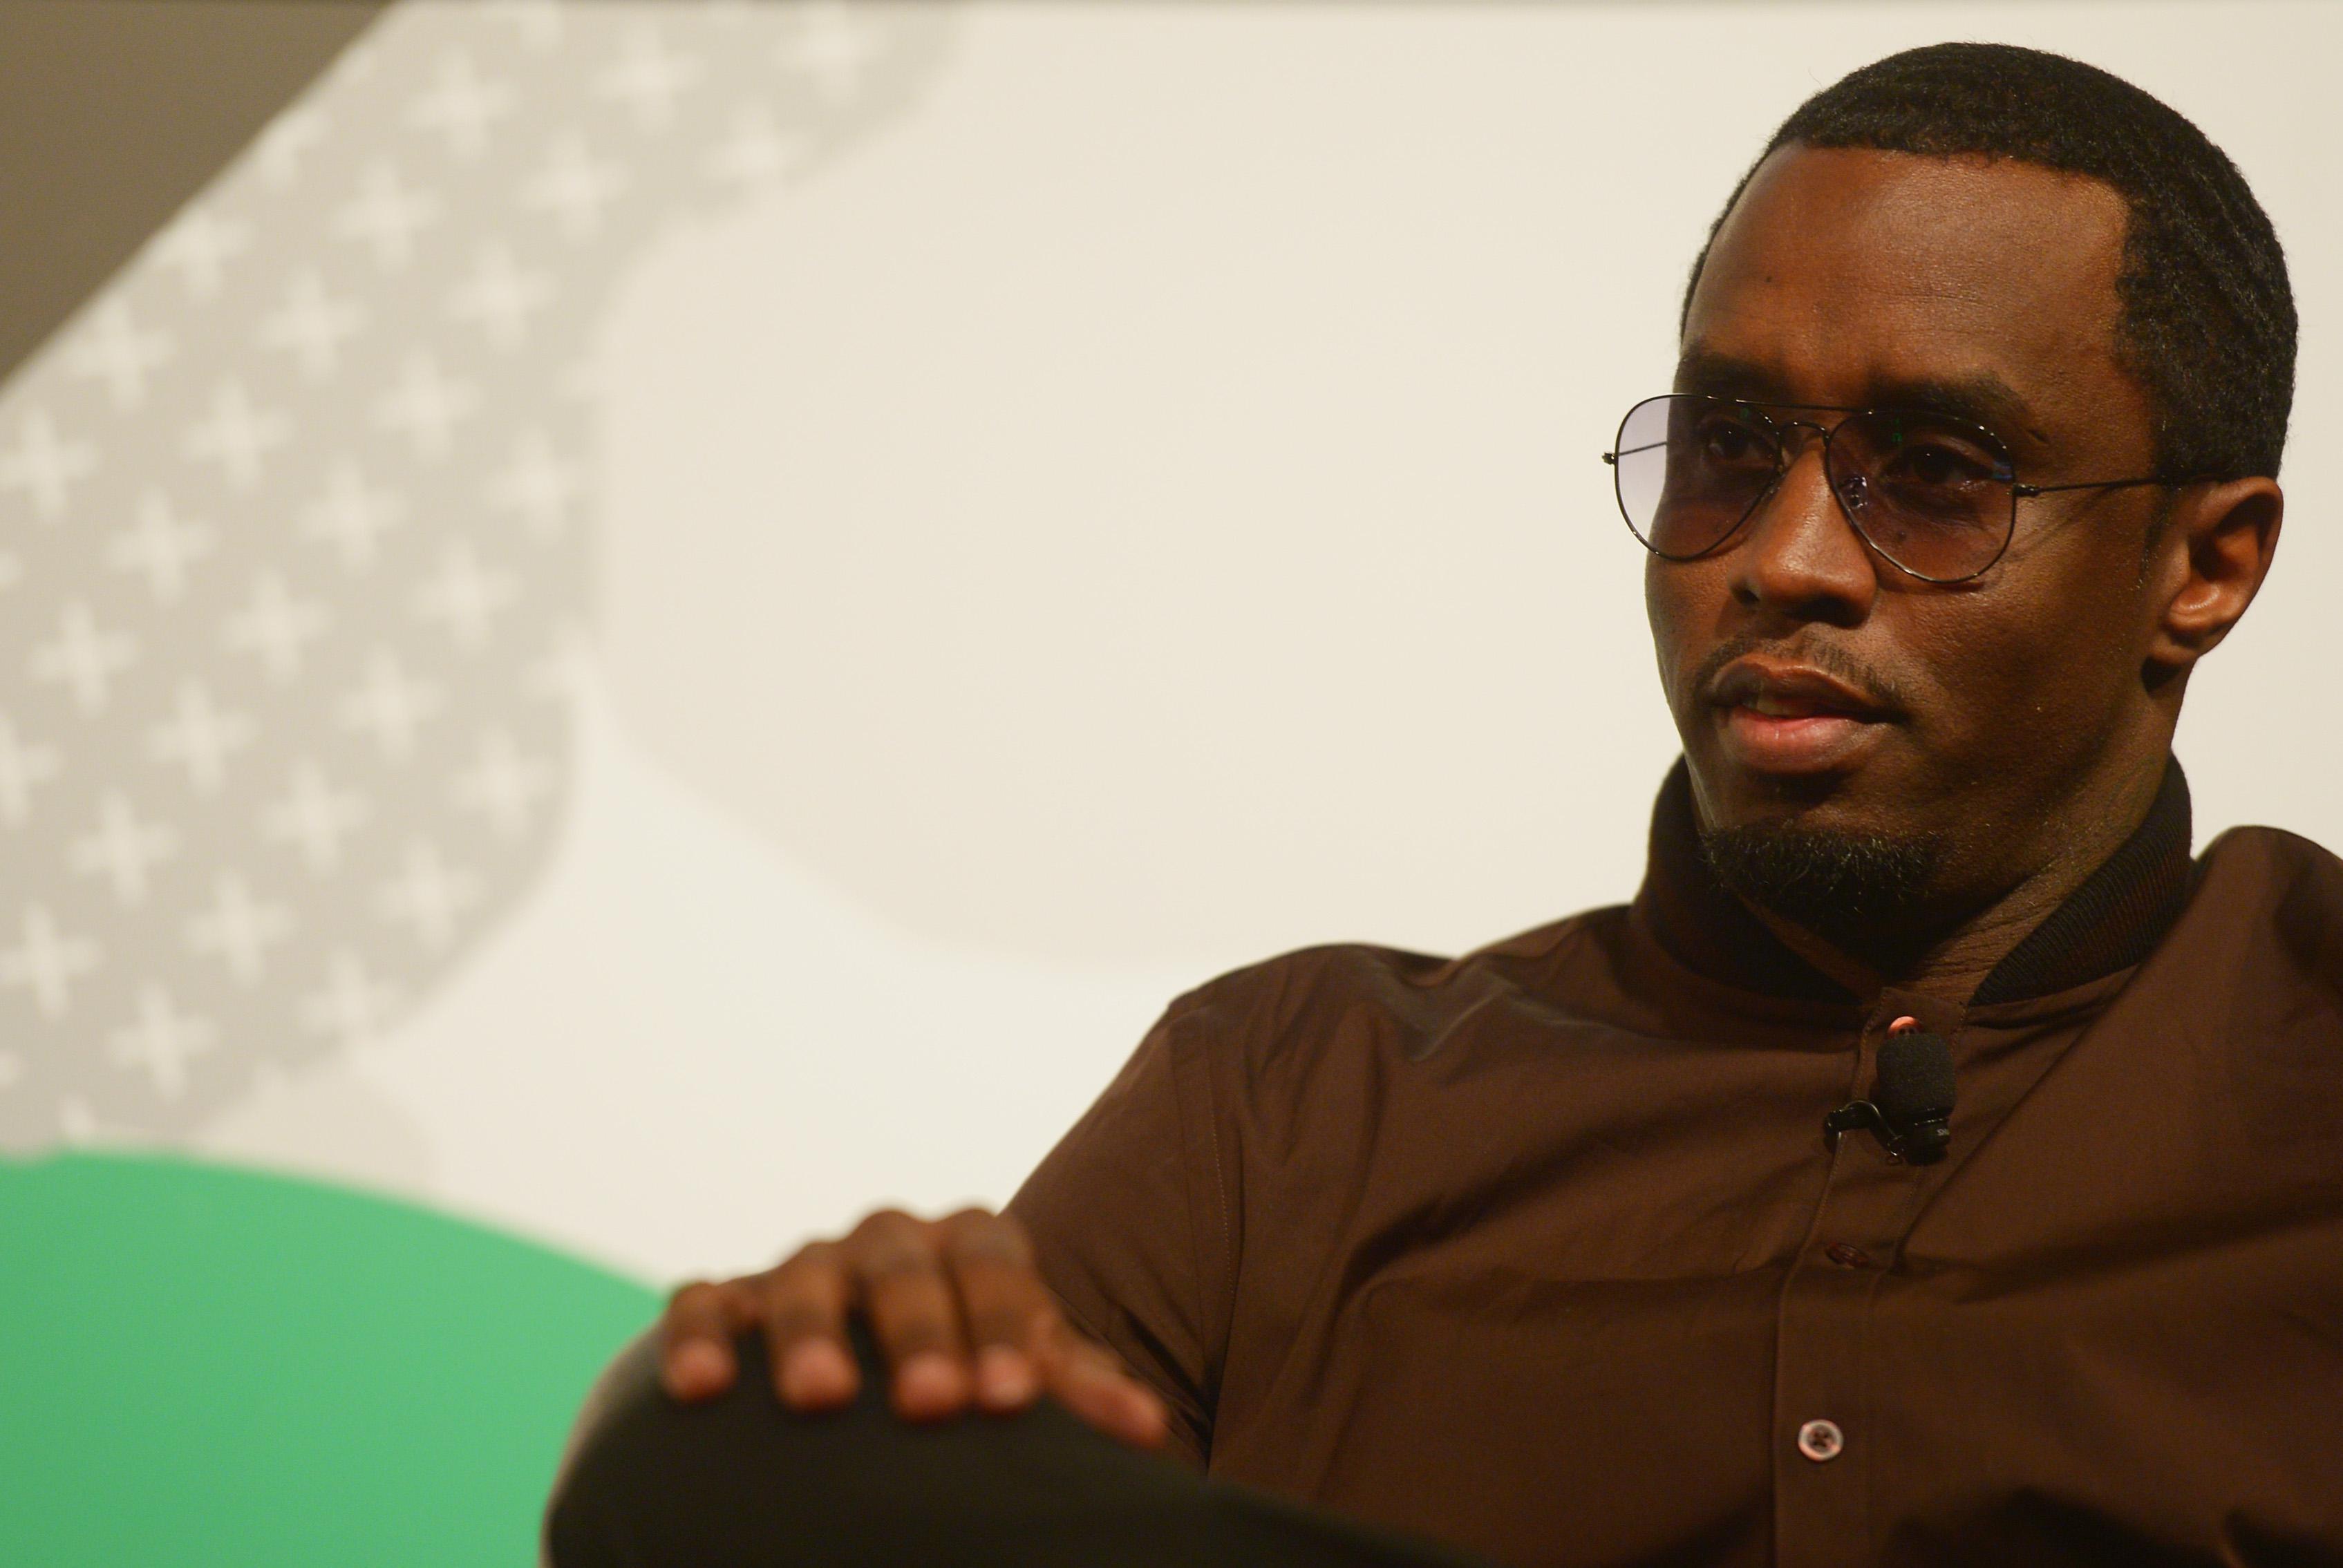 SXSW Interview: Sean 'Diddy' Combs - 2014 SXSW Music, Film + Interactive